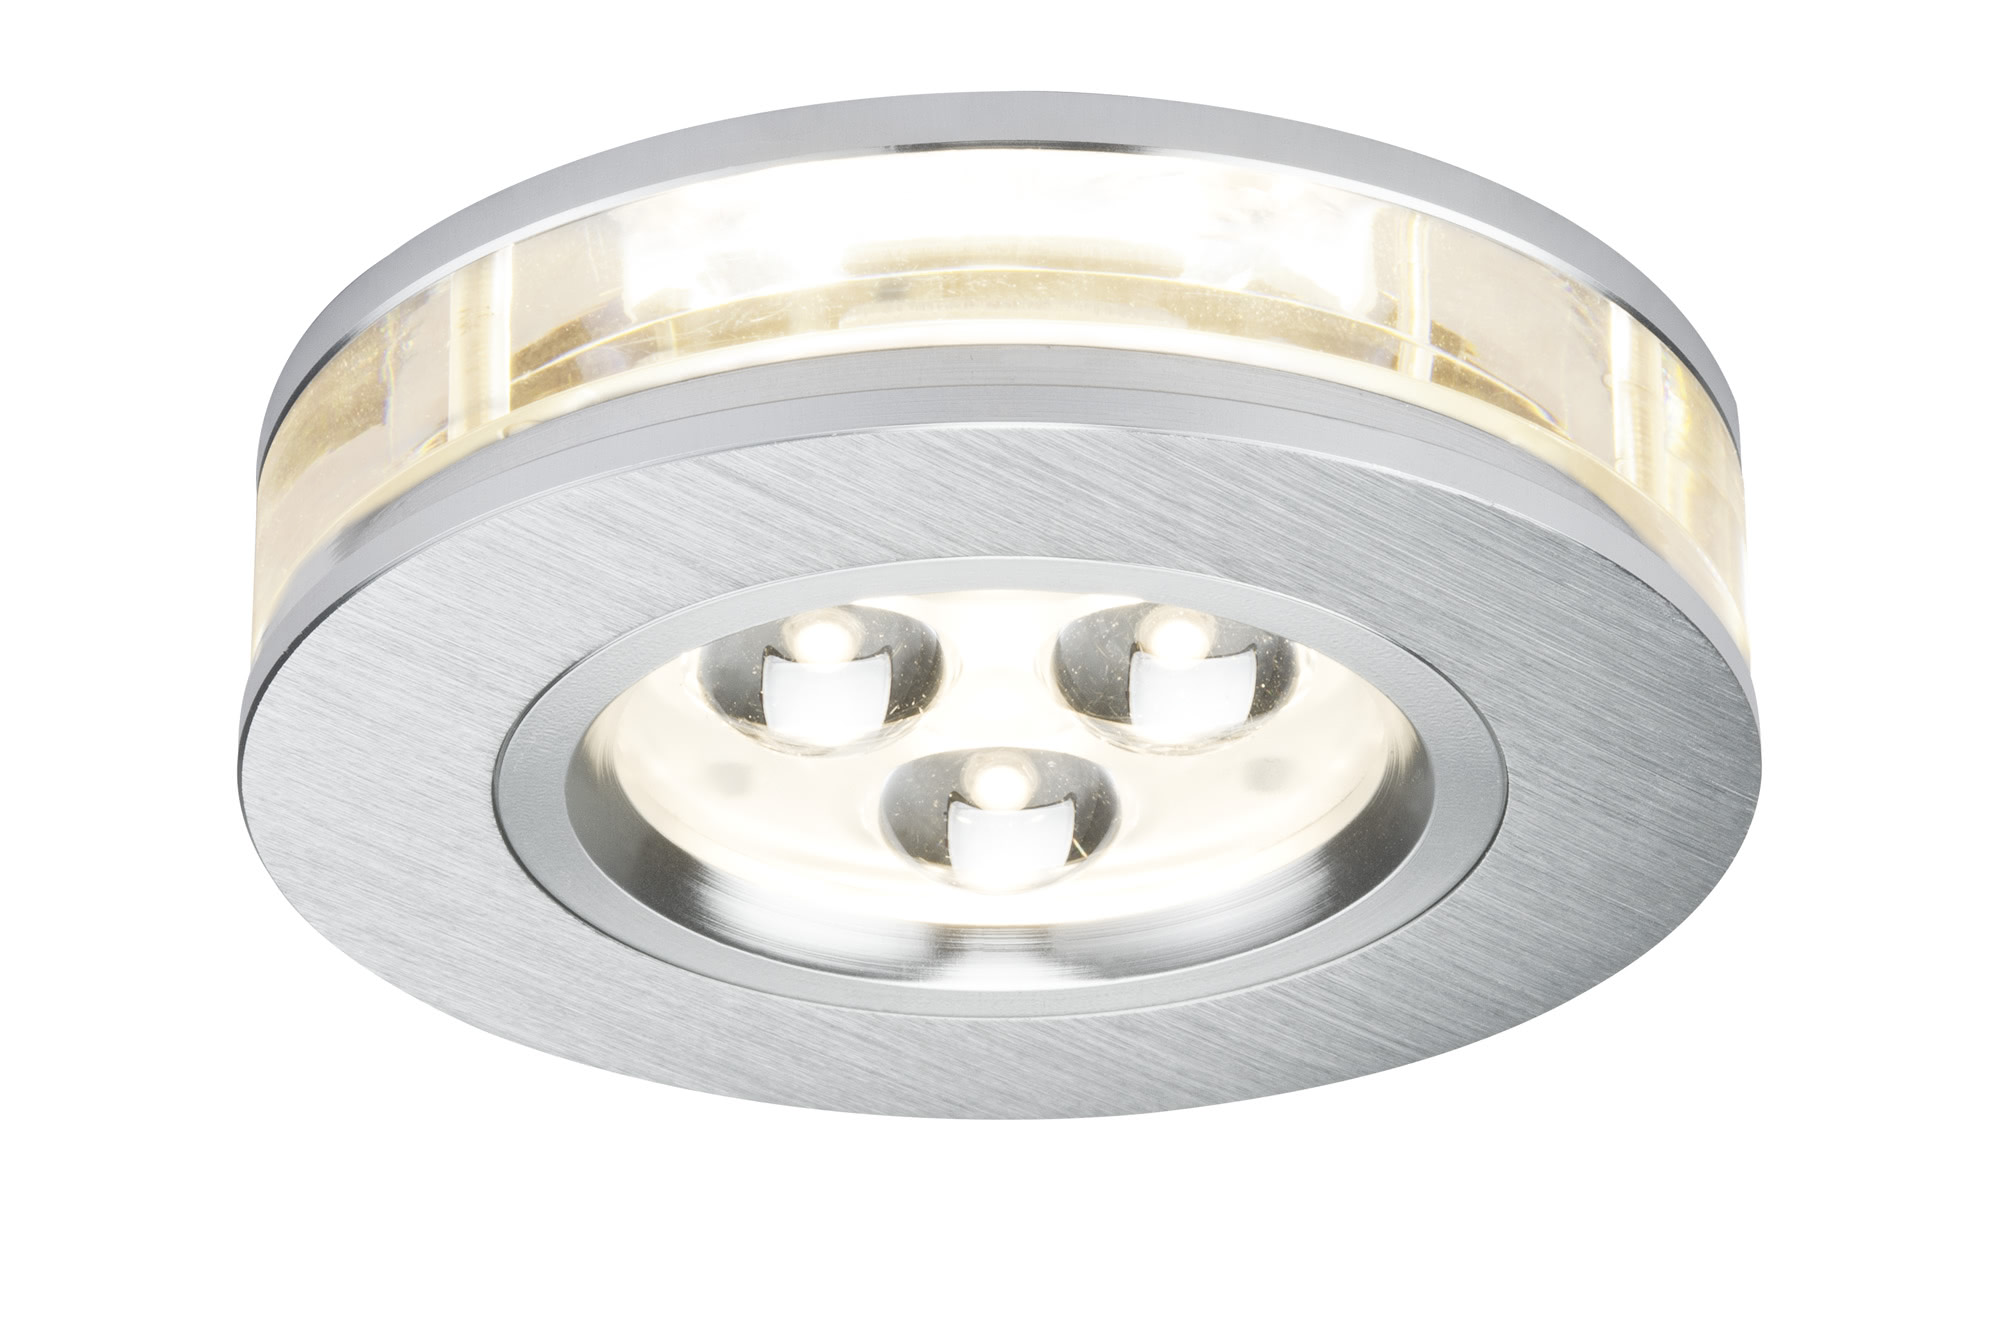 Paulmann. 92540 Светильник встраиваемый Premium EBL Liro rund LED 1x3W Alu-g